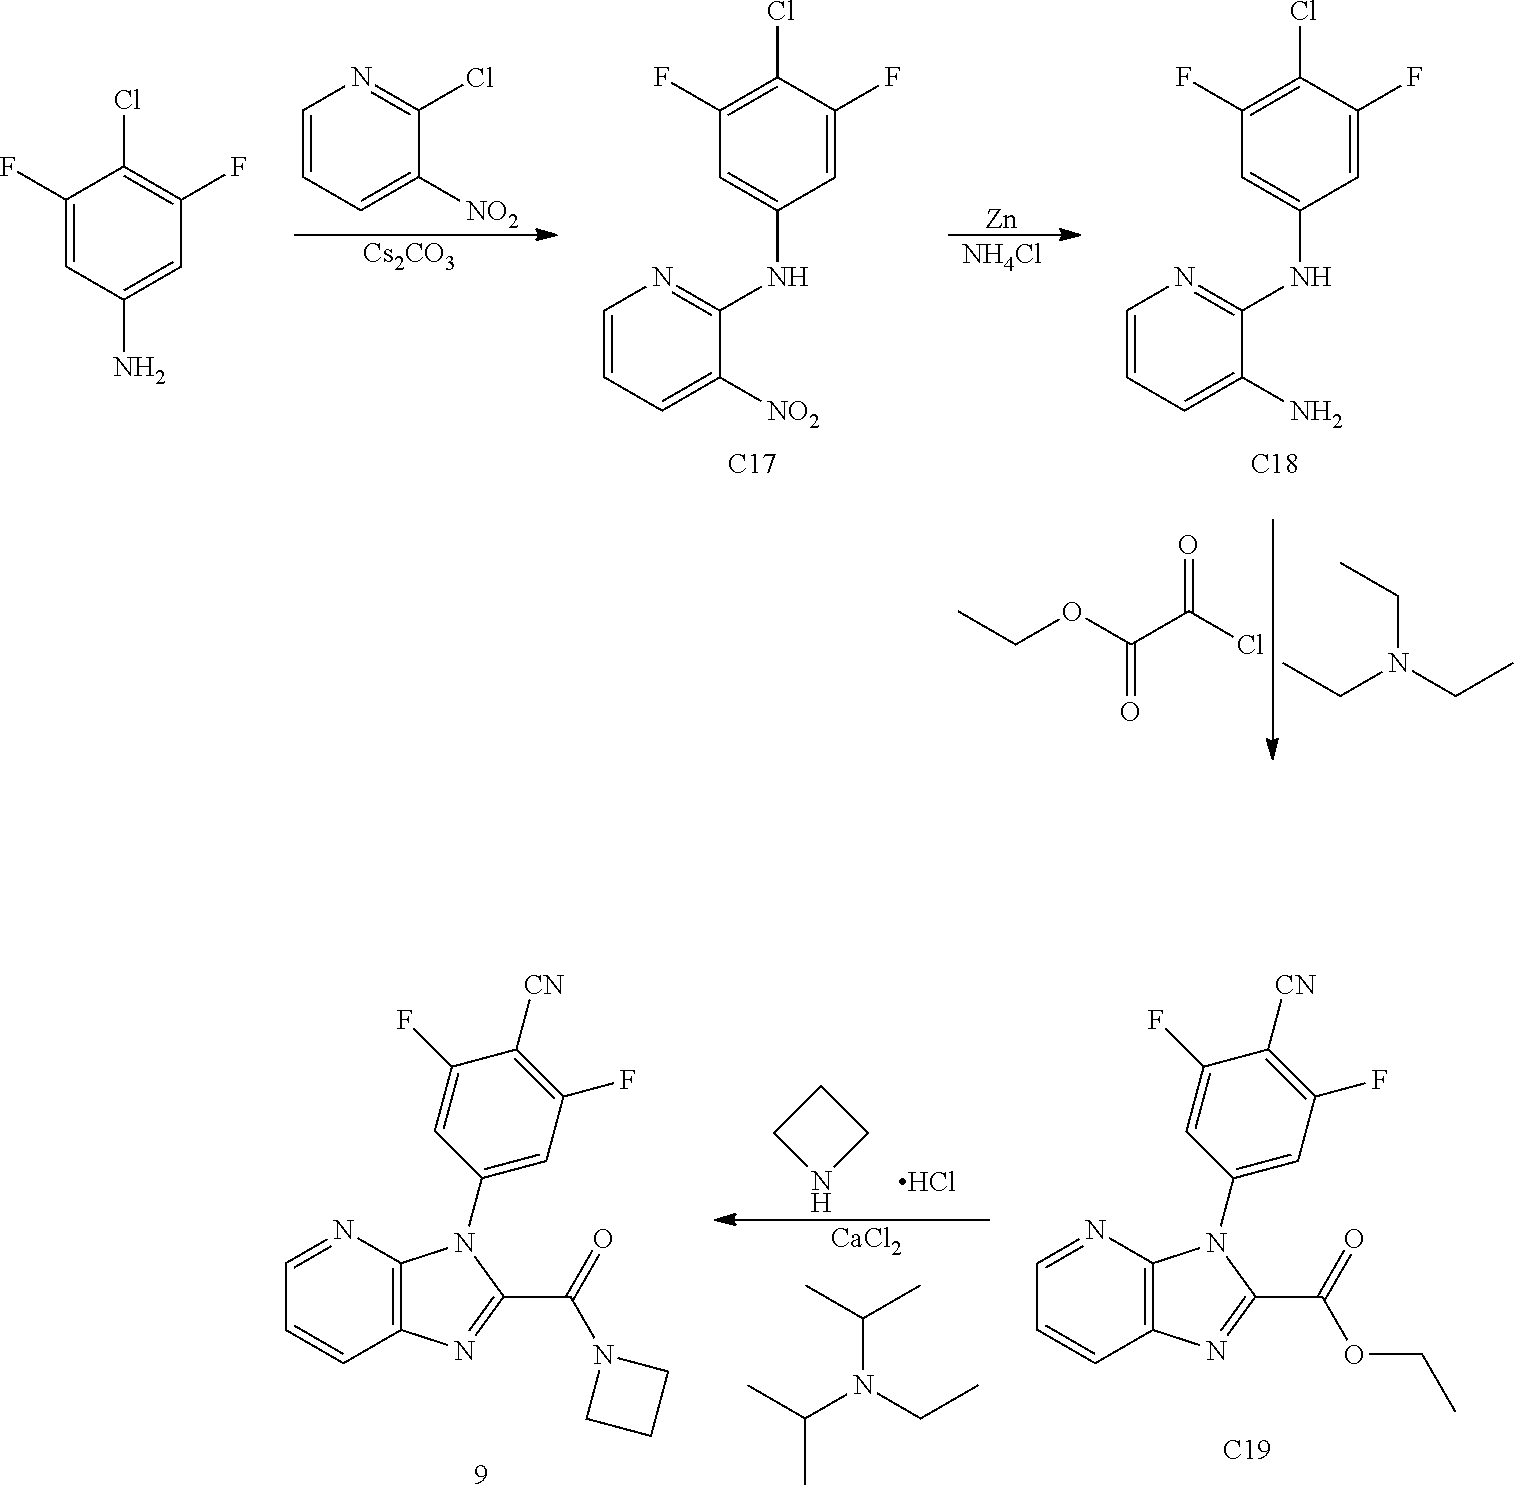 US20140235612A1 - Azabenzimidazole Compounds - Google Patents